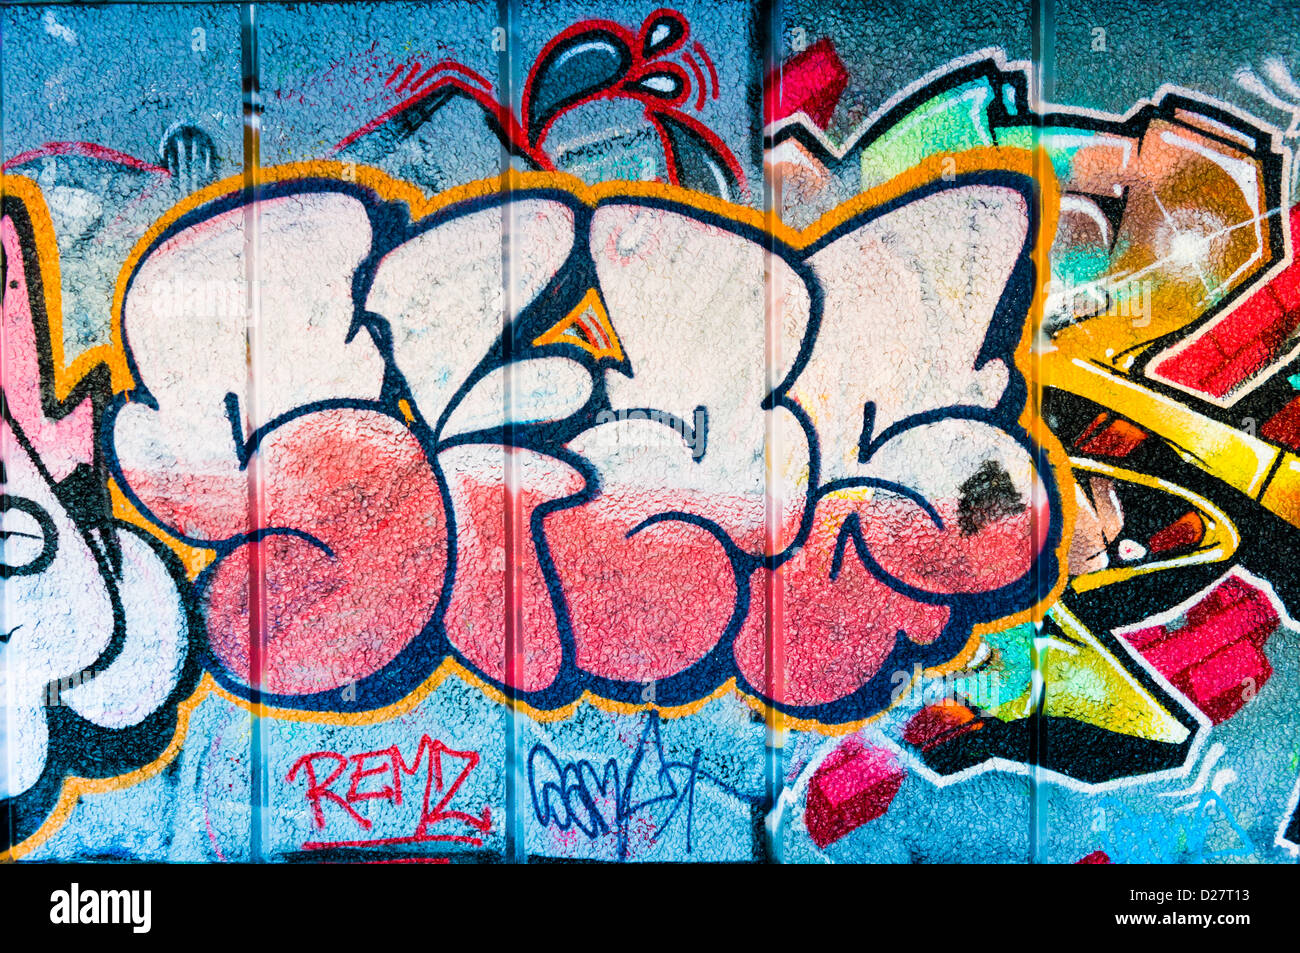 Graffiti street art tag on a wall, UK Stock Photo